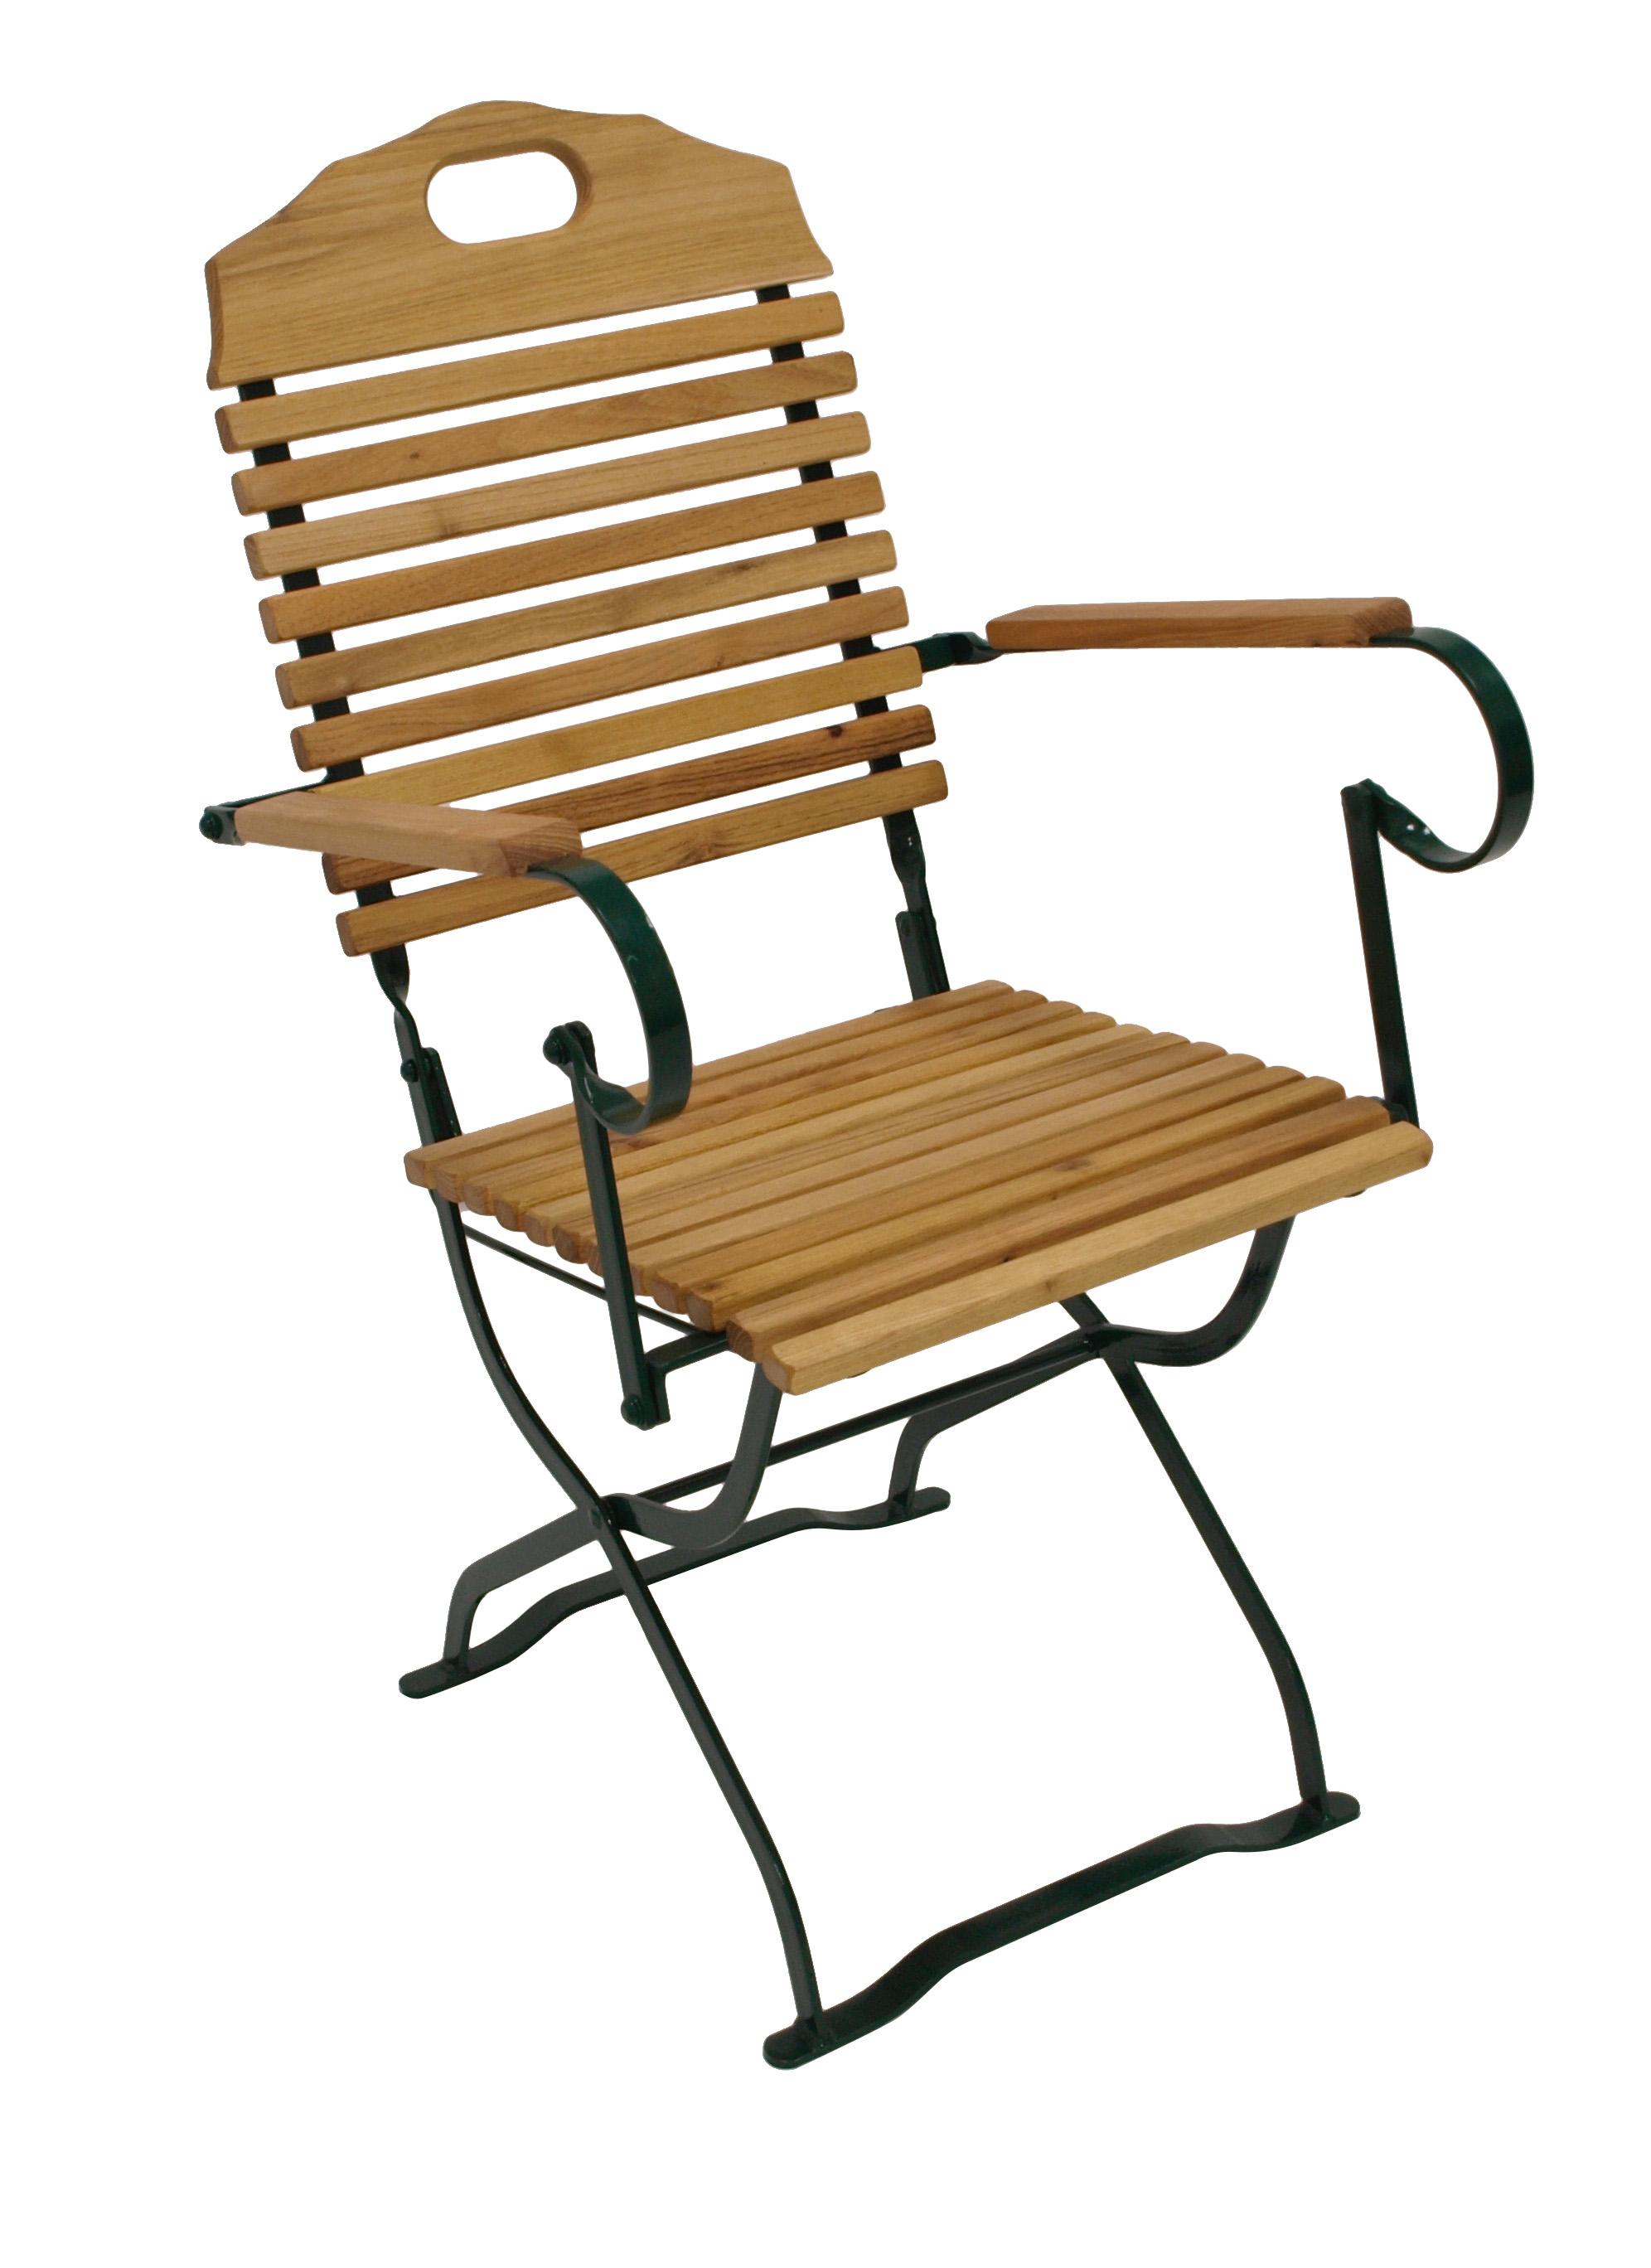 kurgarten armlehnensessel bad t lz stahl gr n robinie 2 wahl ebay. Black Bedroom Furniture Sets. Home Design Ideas